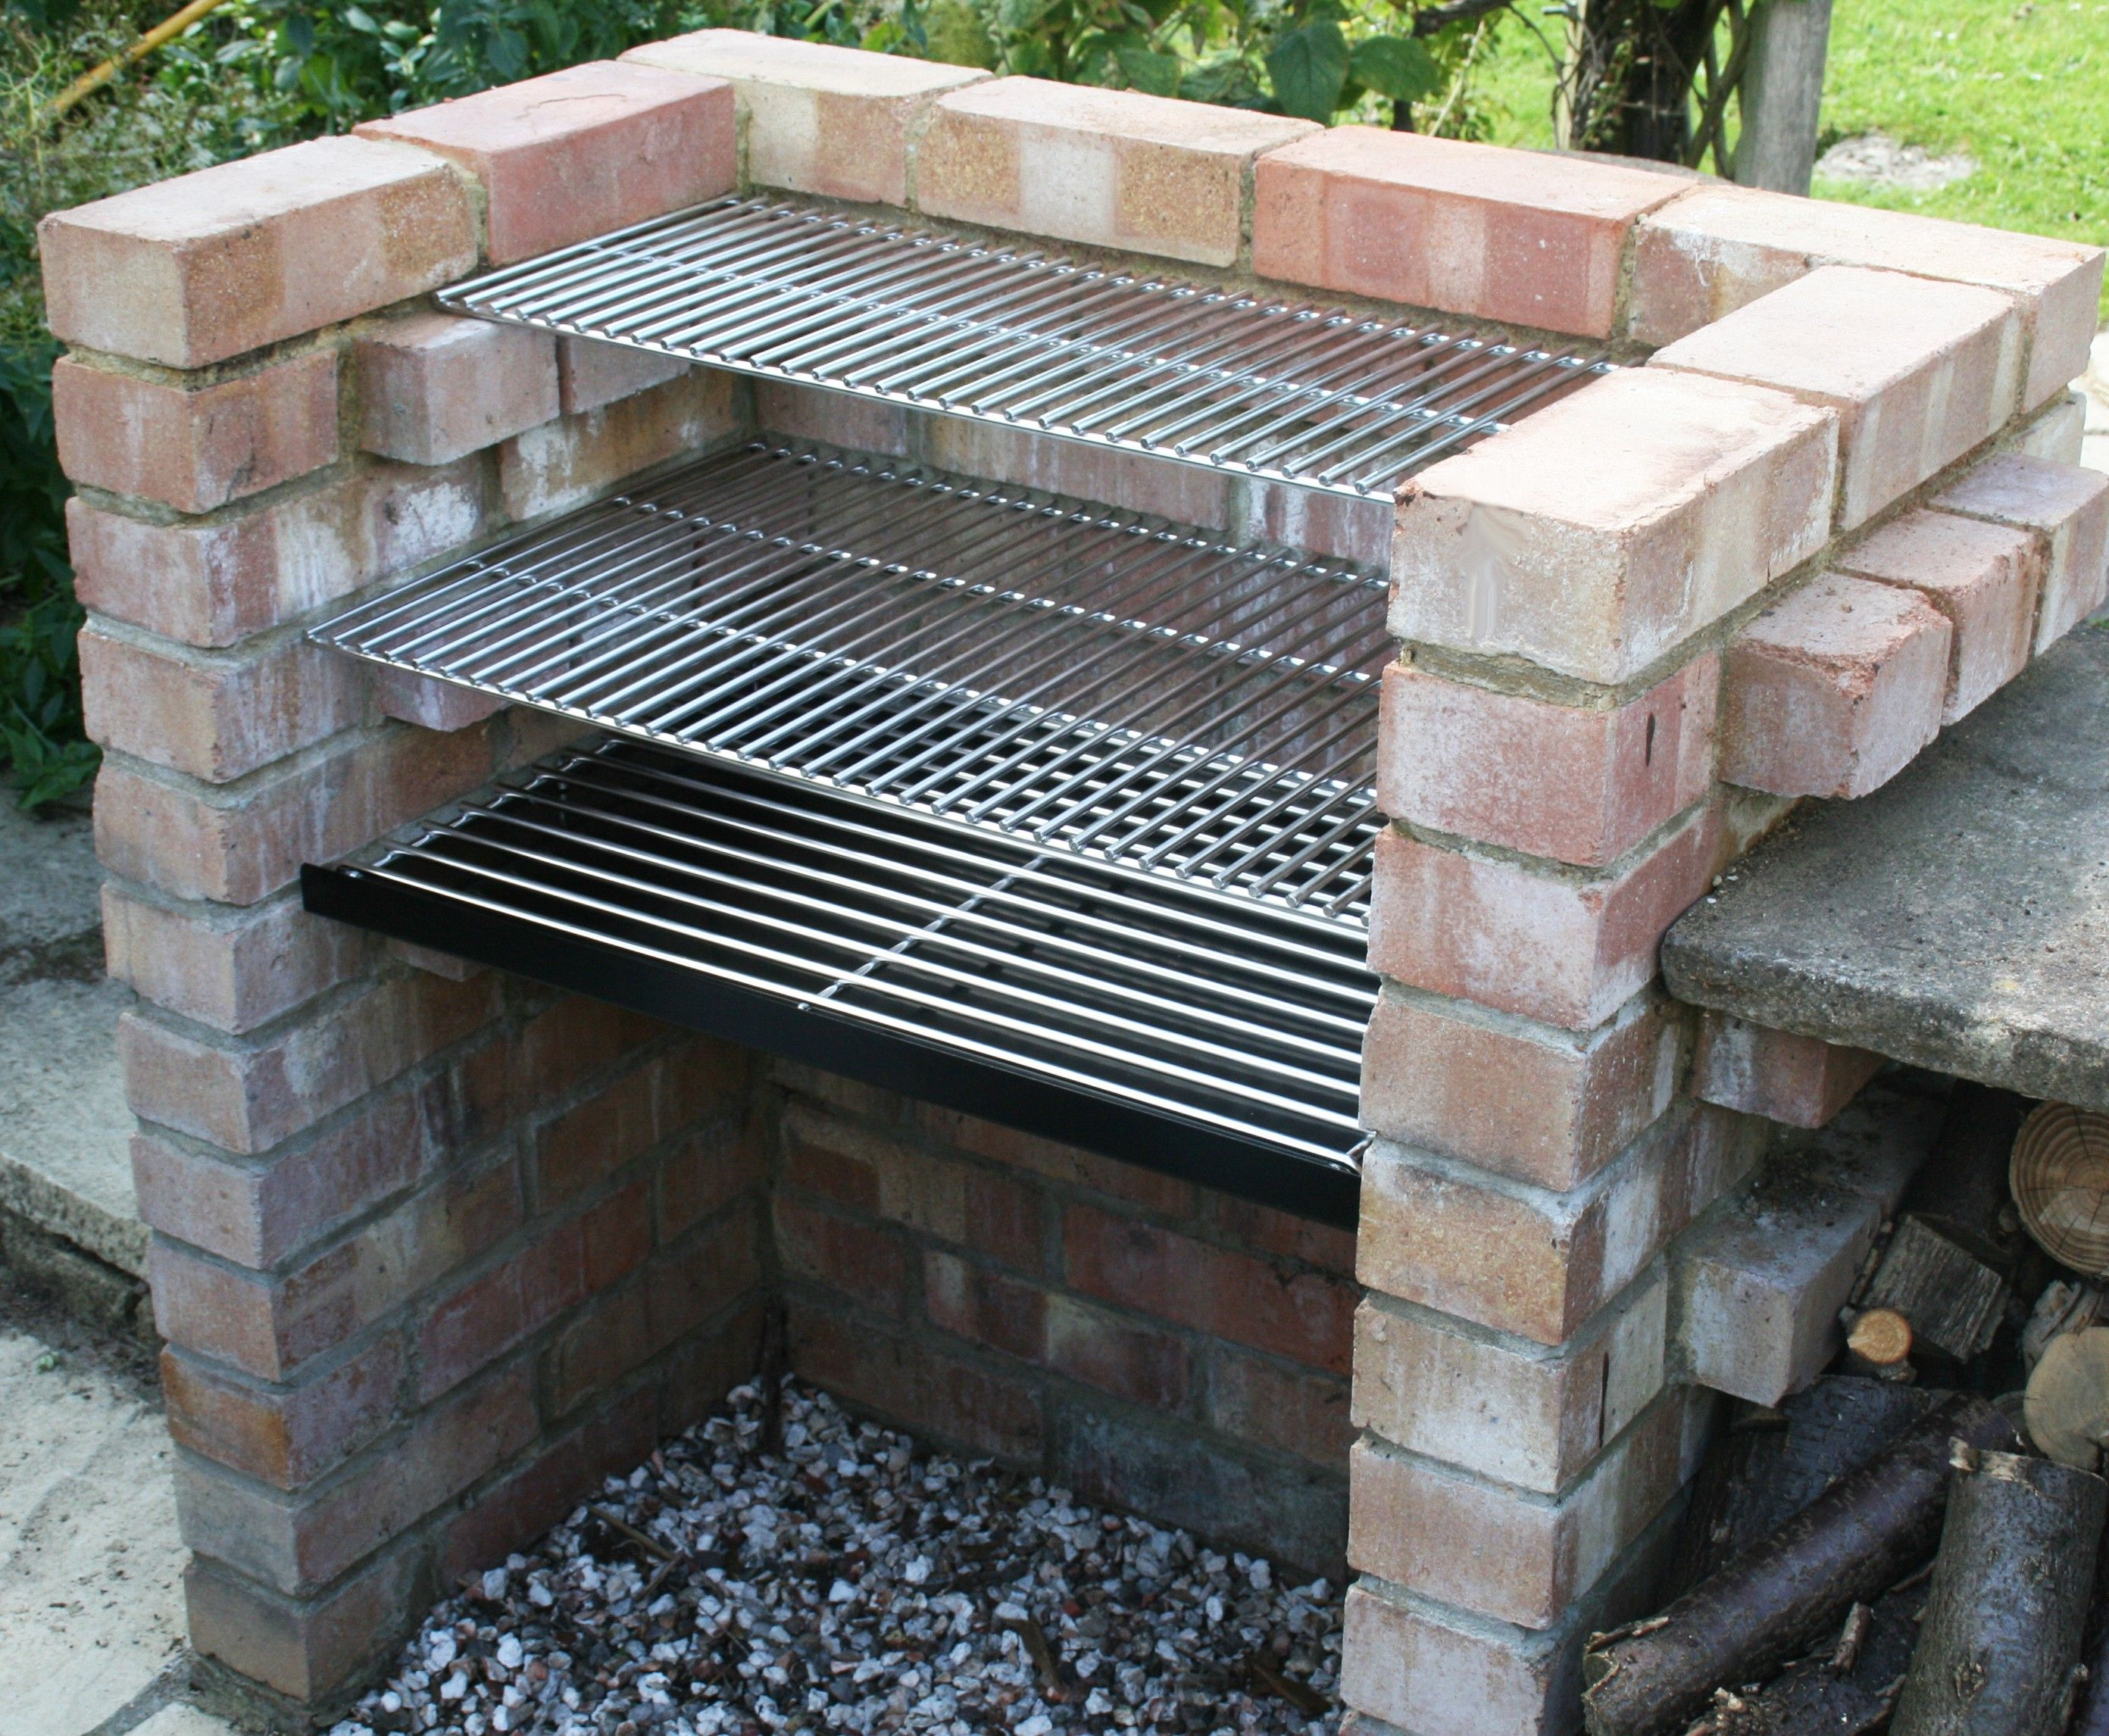 Heavy duty 6mm brick diy bbq kit ss104b garden pinterest bricks brick bbq and backyard - Building an outdoor brick barbecue ...